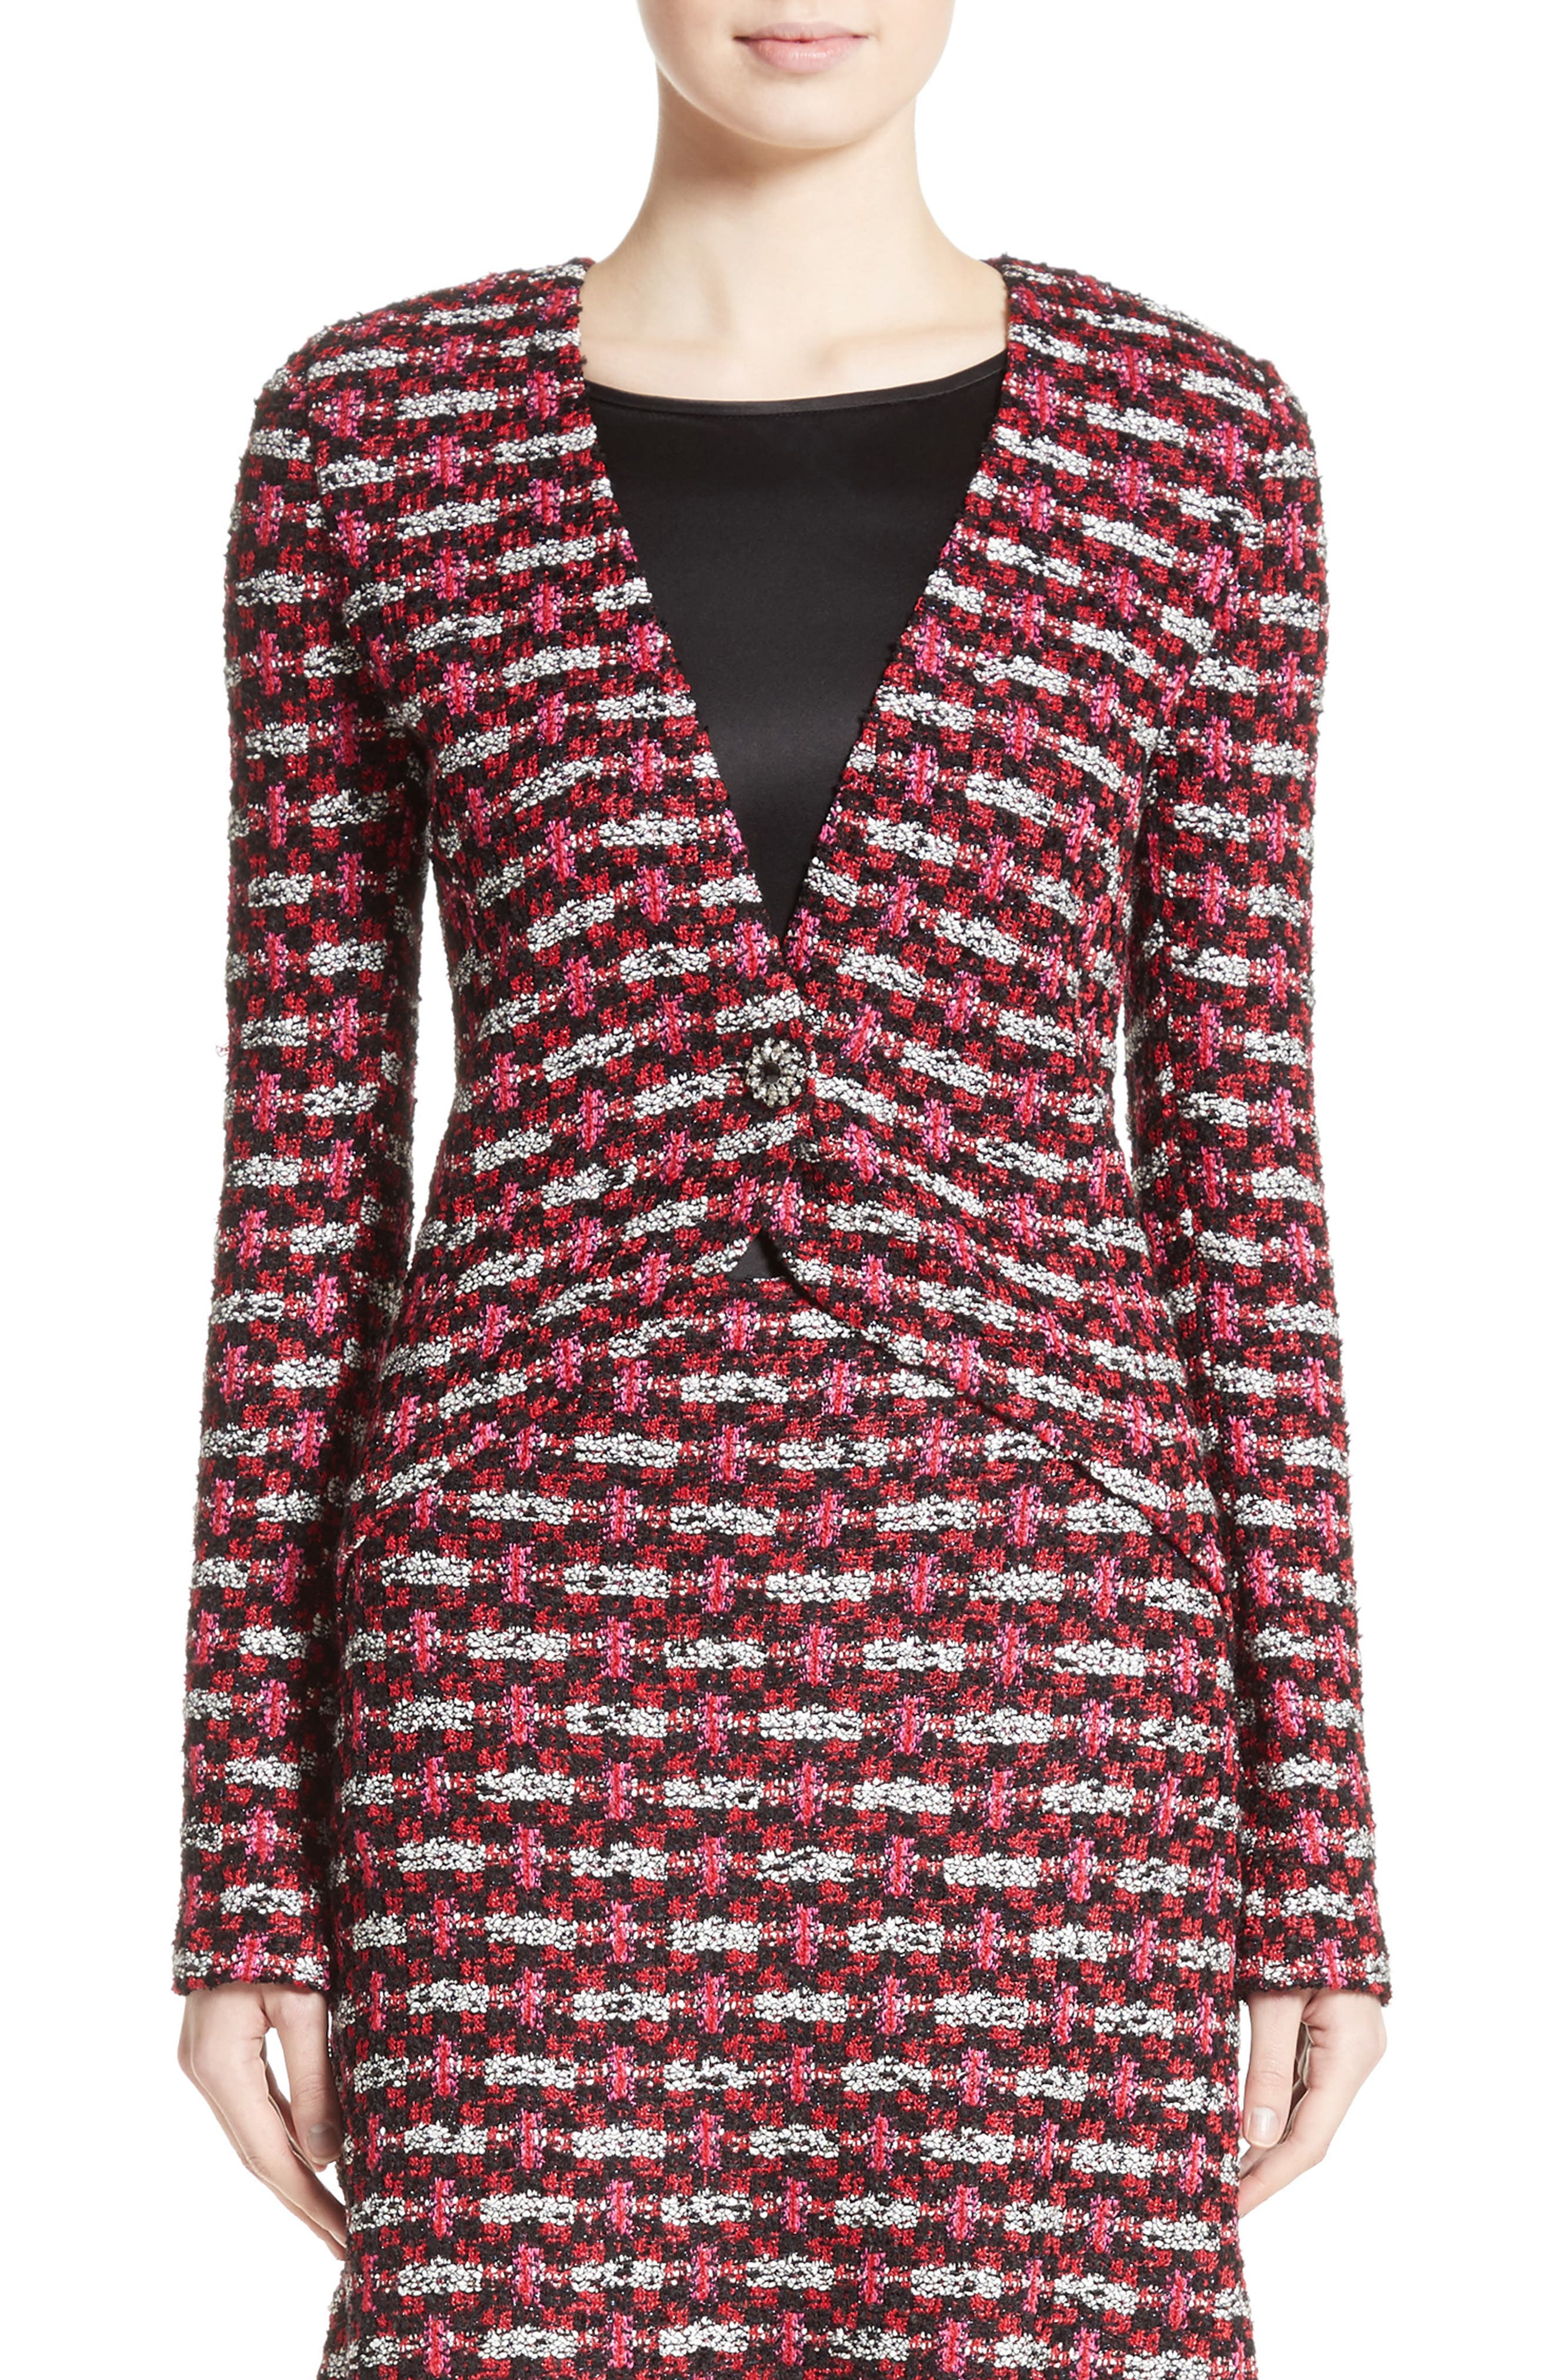 Hiran Tweed Knit Jacket,                         Main,                         color, Scarlet Multi